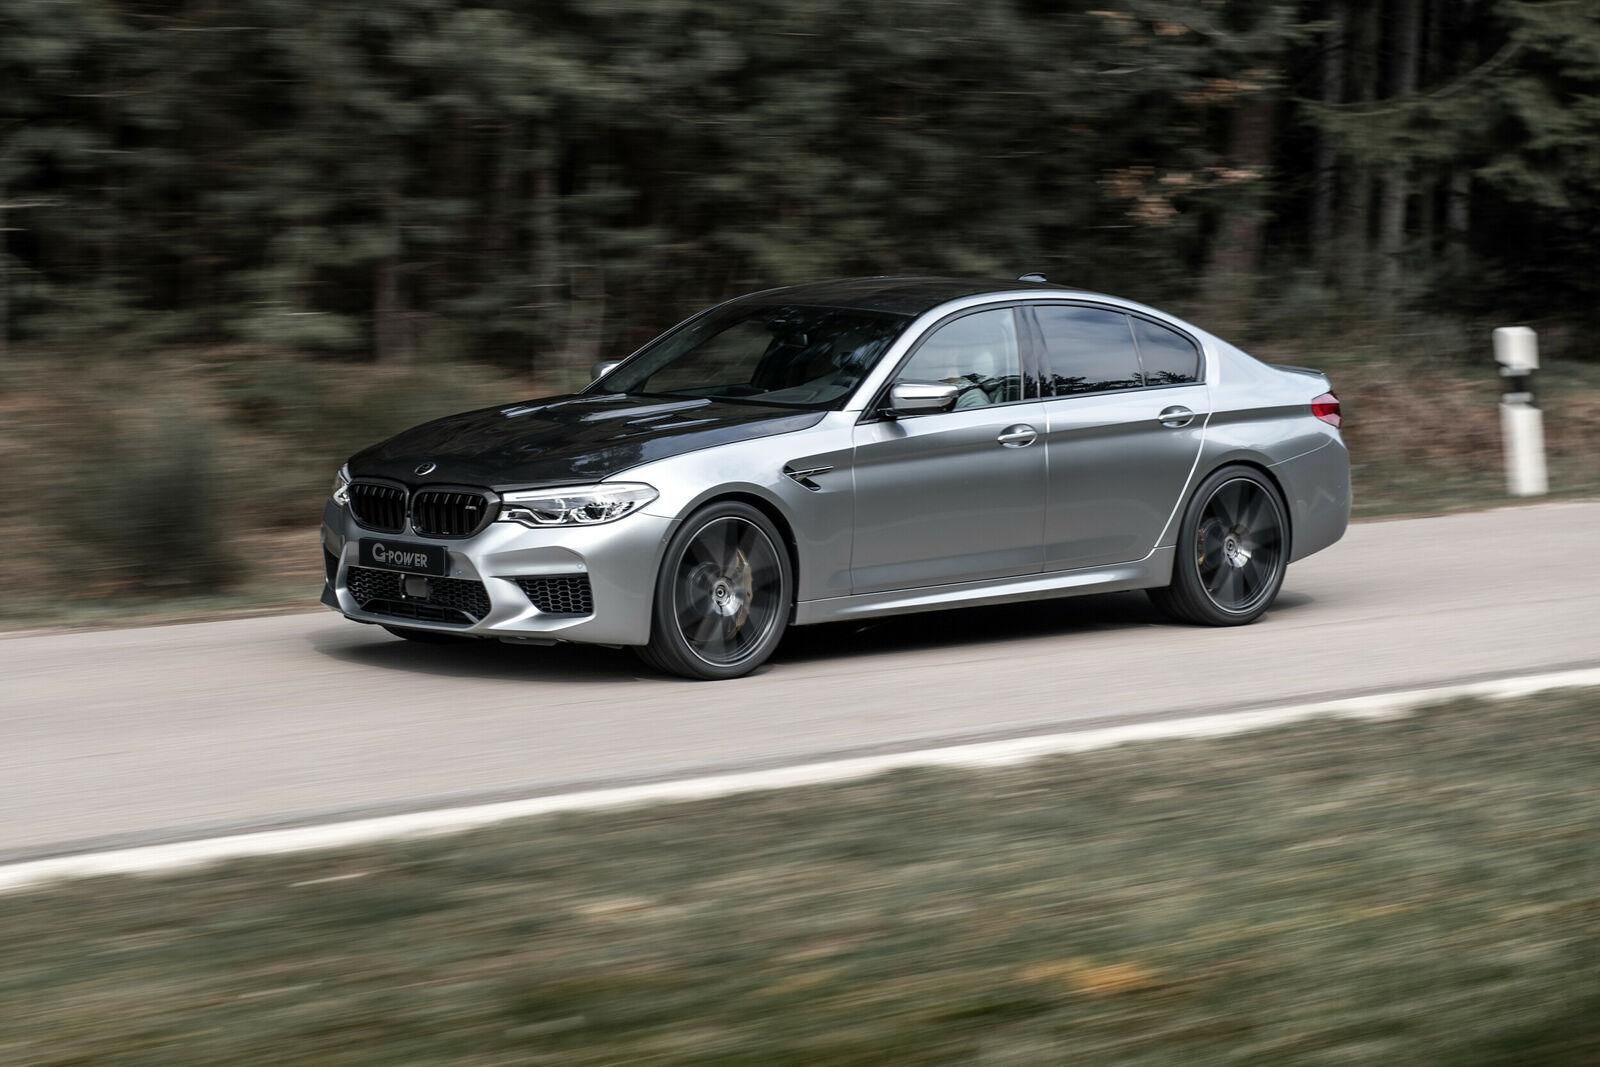 BMW_M5_G-Power_carbon_0004